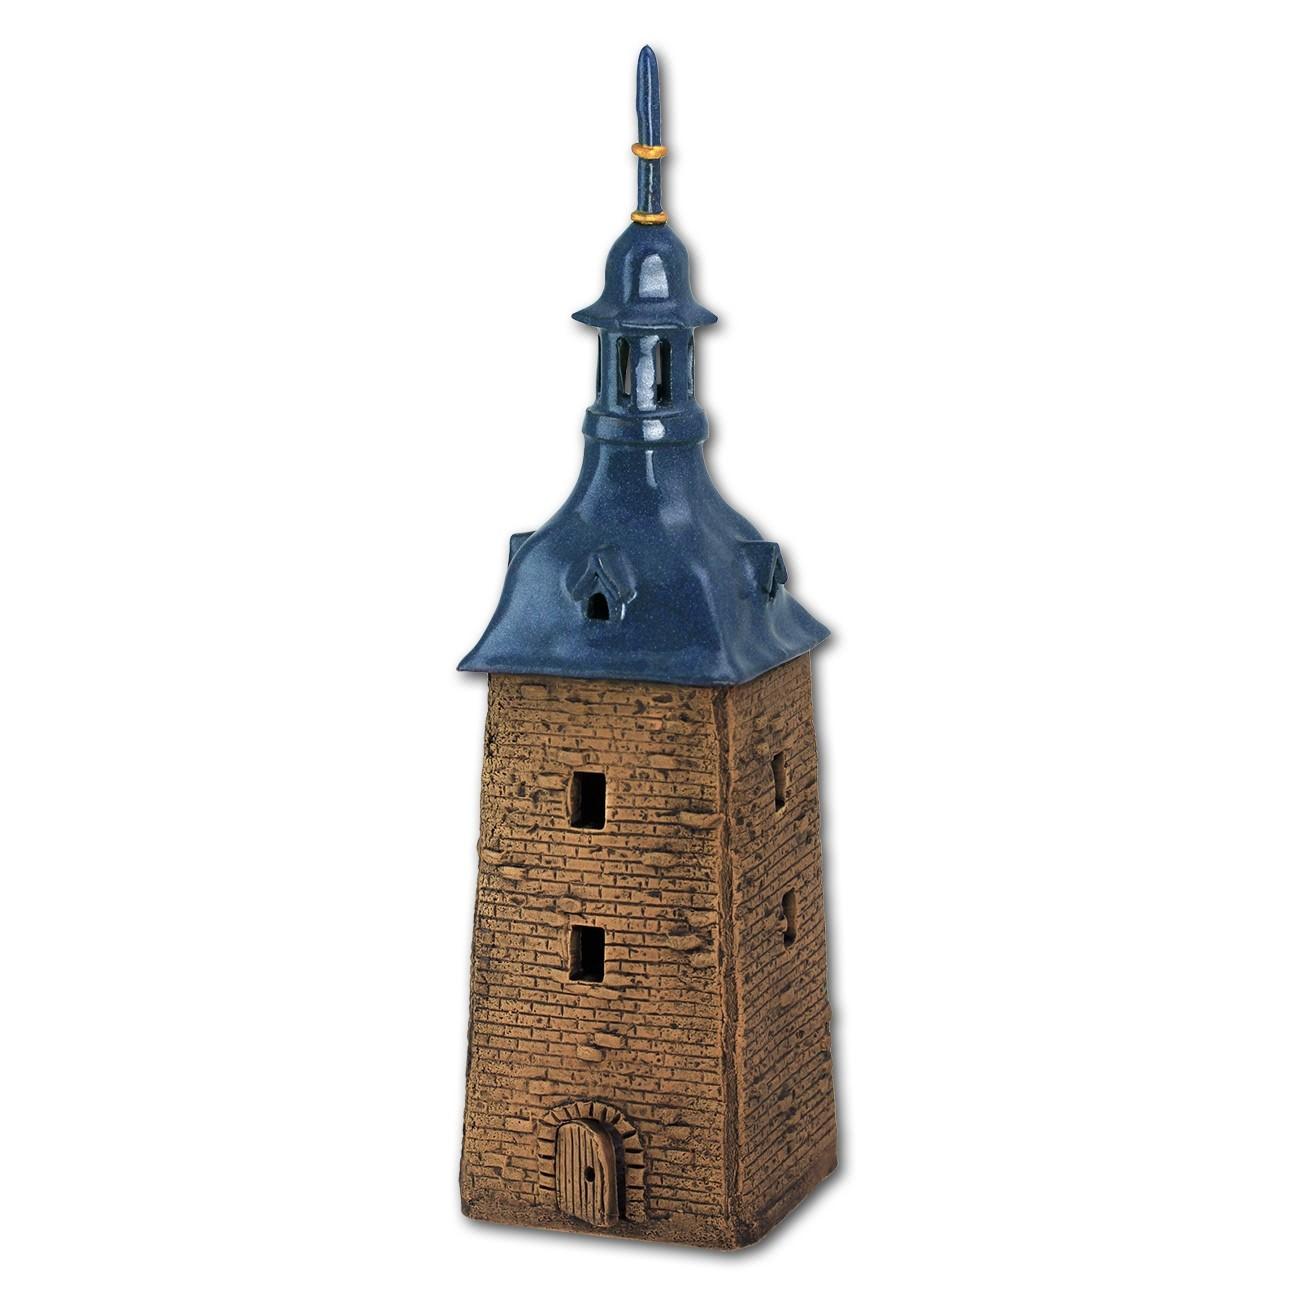 Magdeburger Turm Köthen - Lichthaus original LeuchtKeramik KOM02N